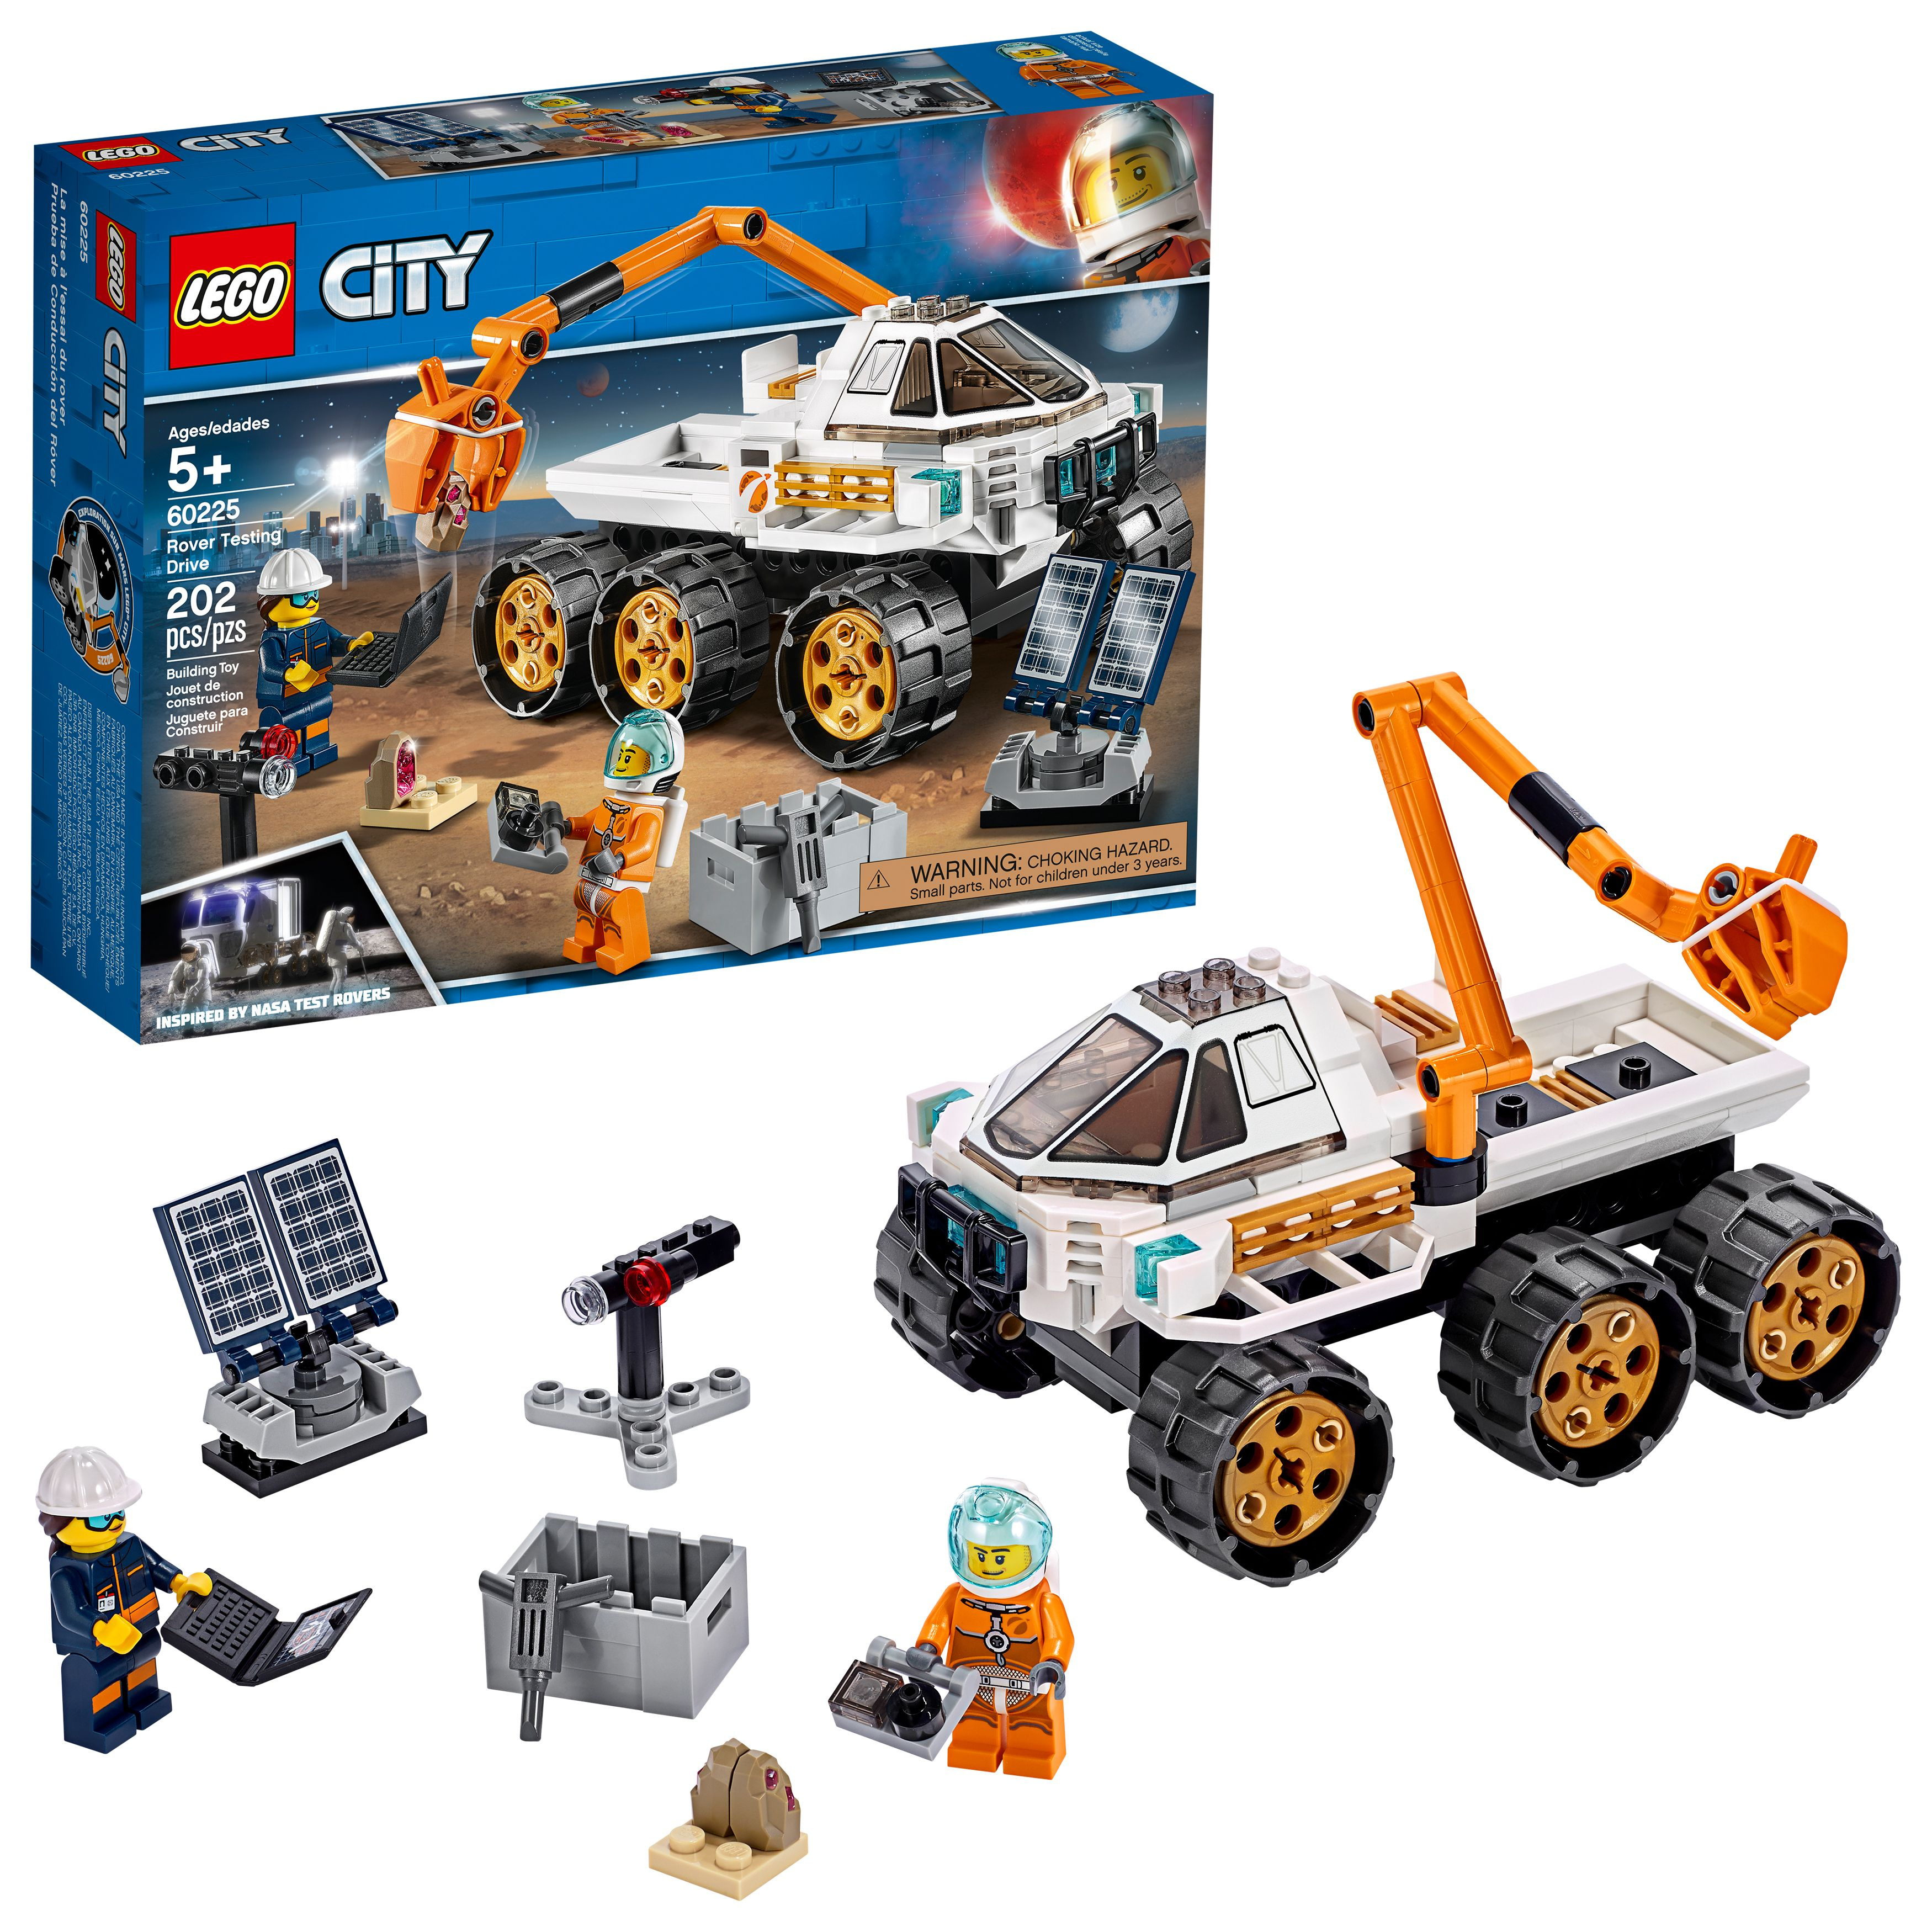 Lego City Sets Space